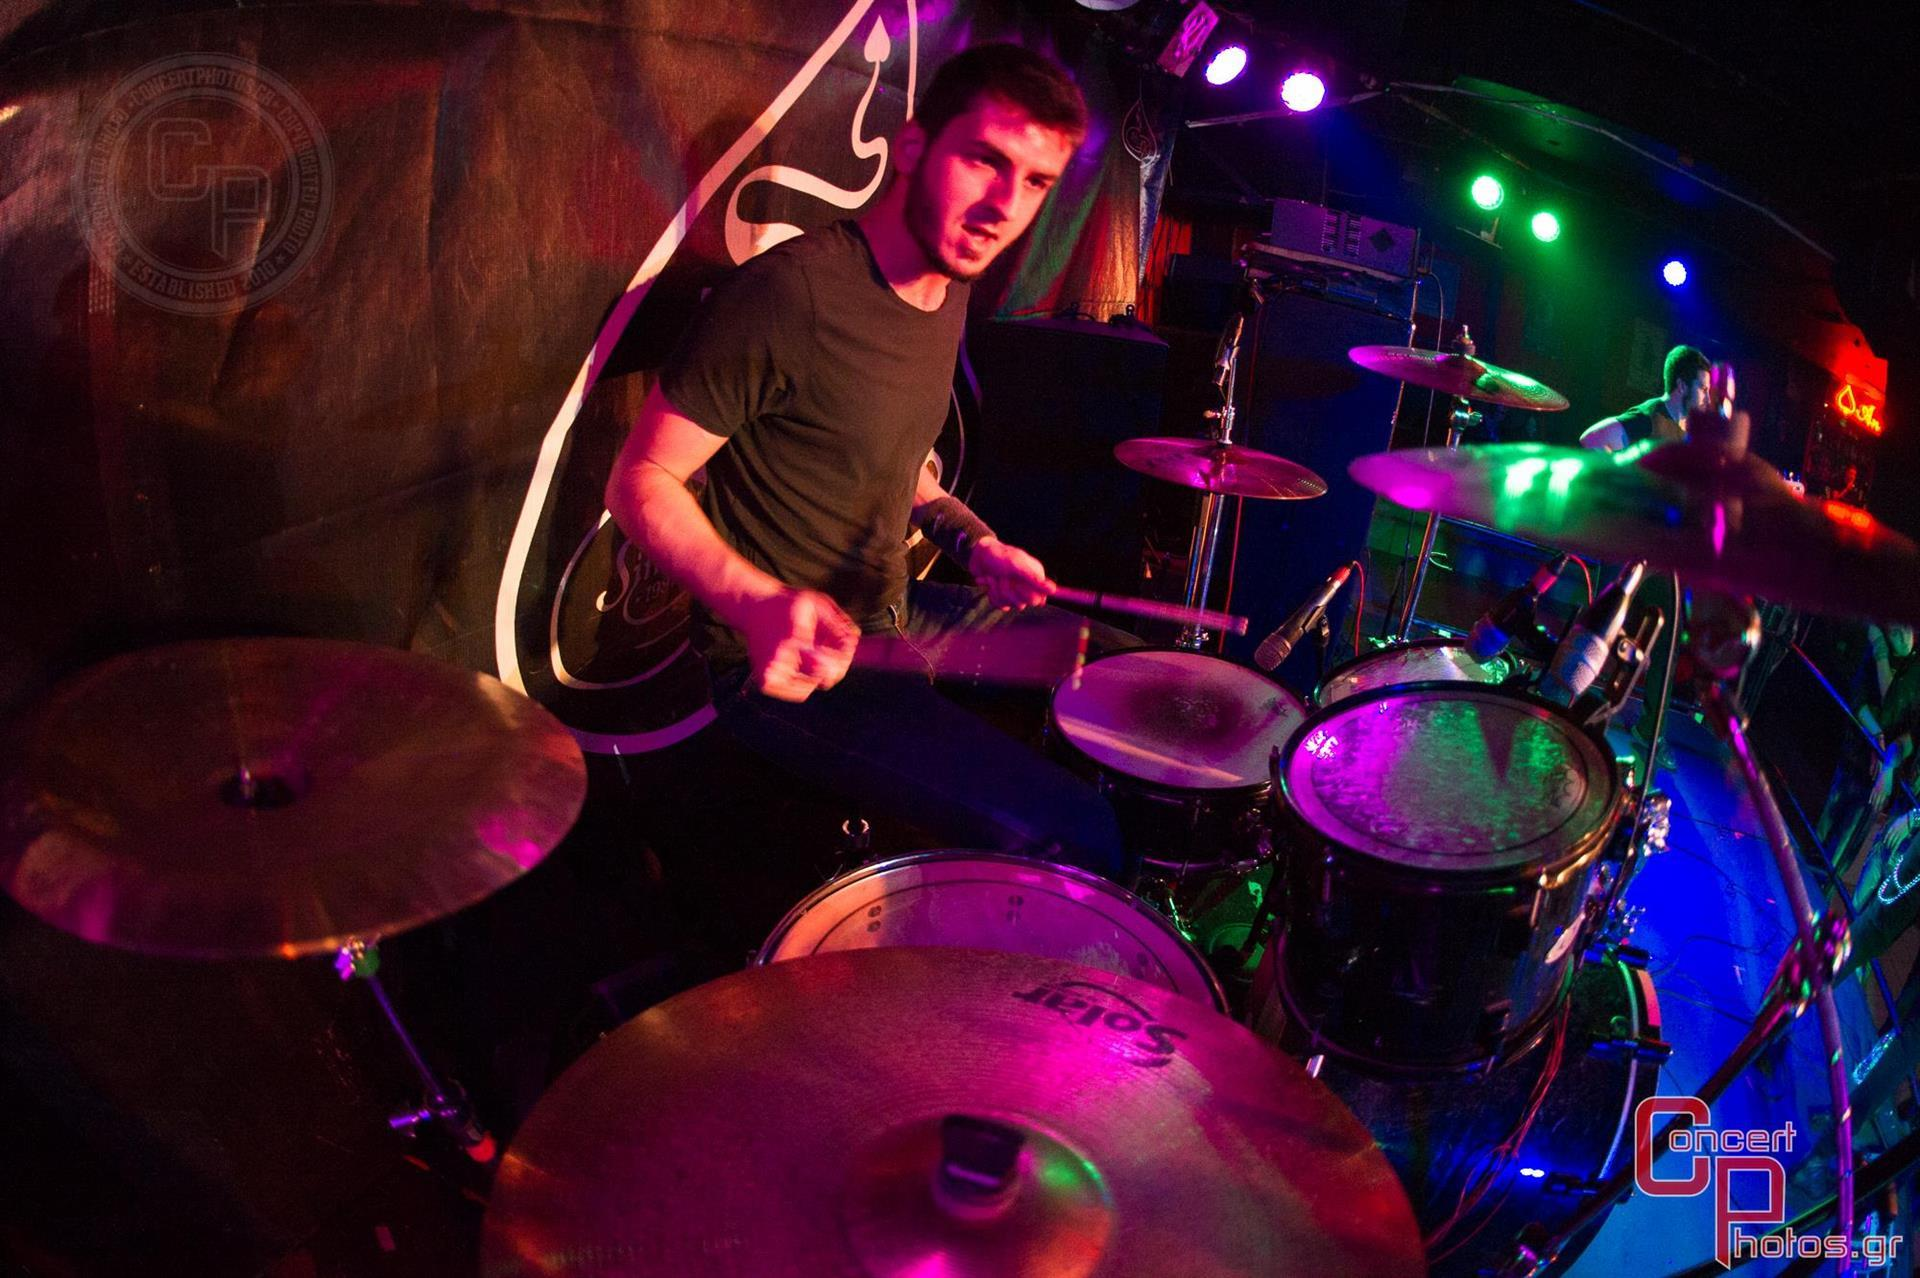 Battle Of The Bands Athens - Leg 3- photographer:  - ConcertPhotos - 20150104_2234_35